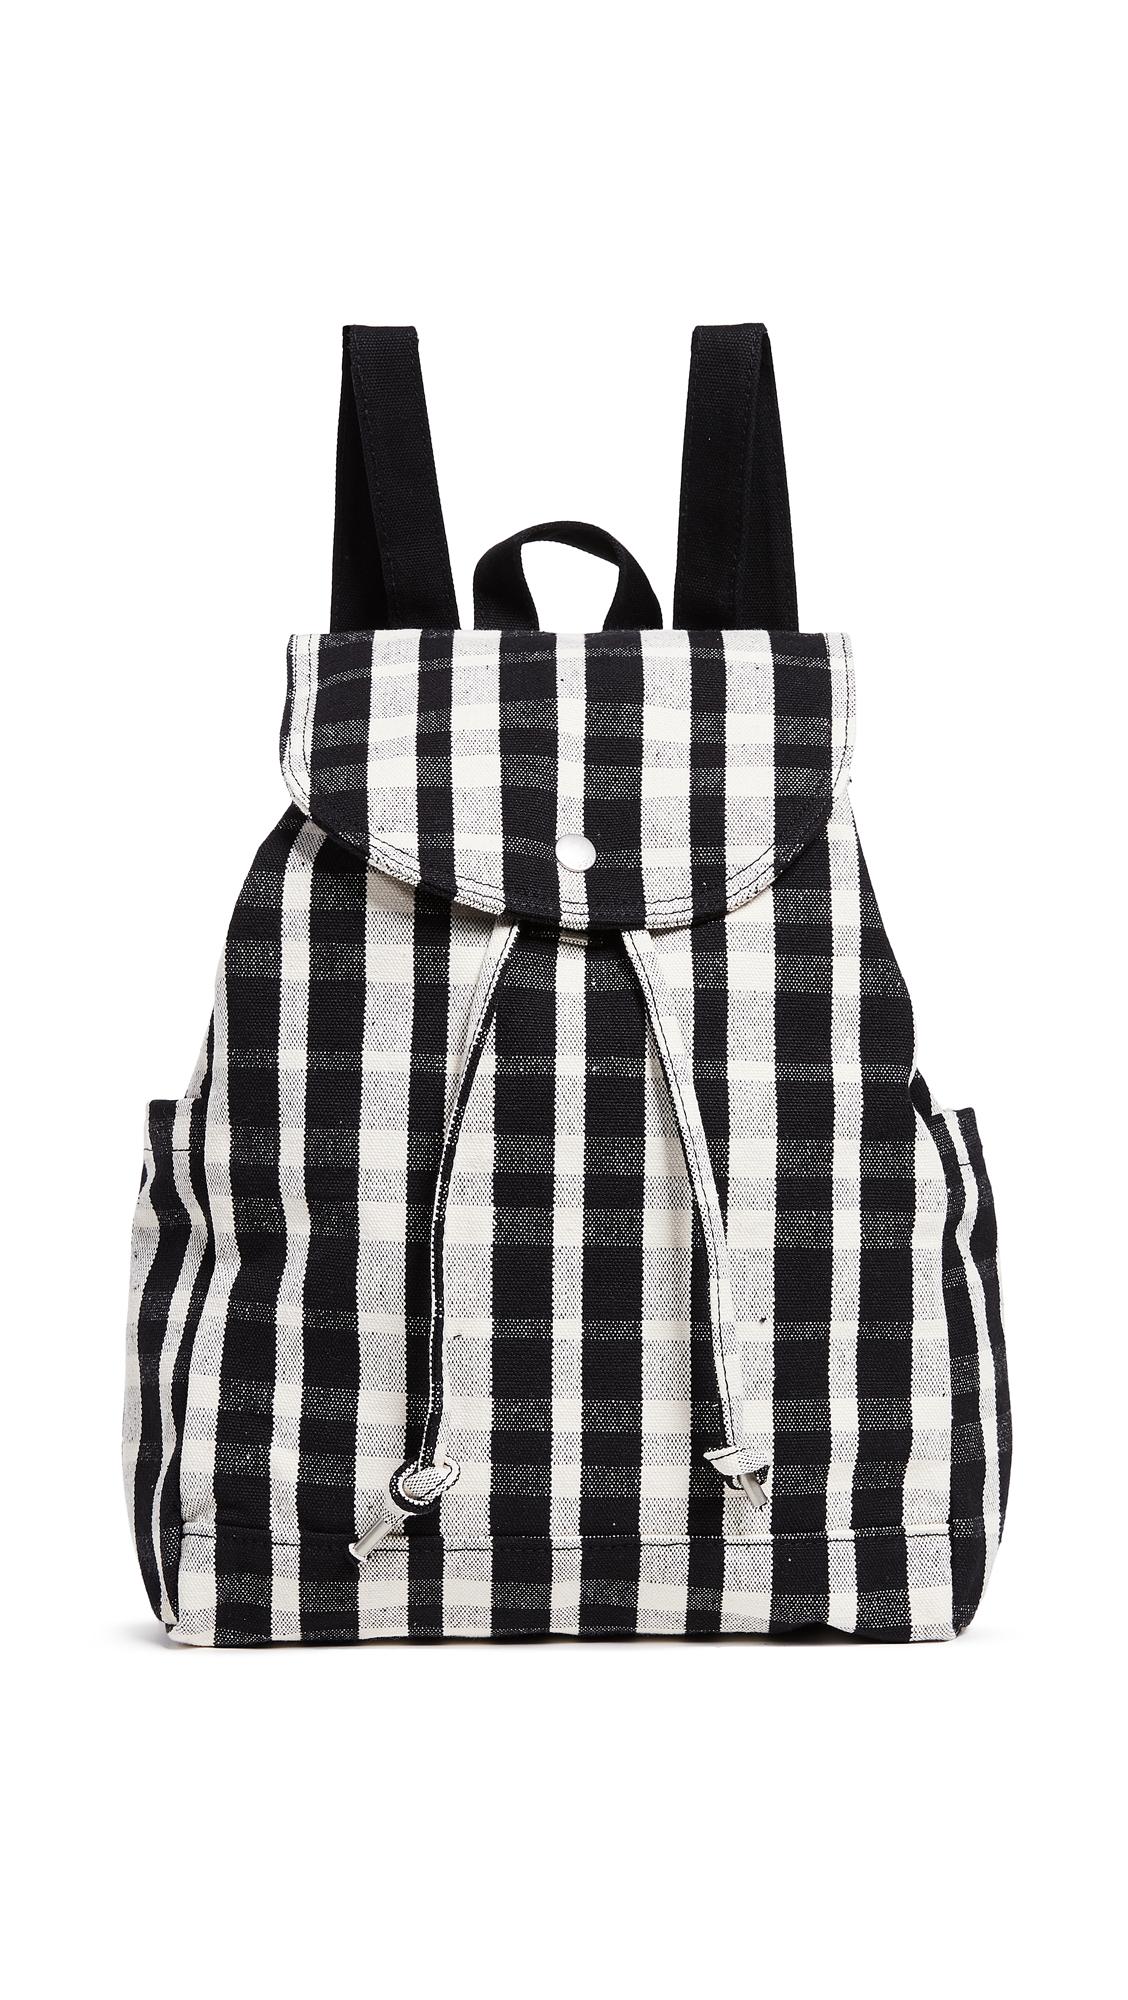 BAGGU Drawstring Backpack in Plaid